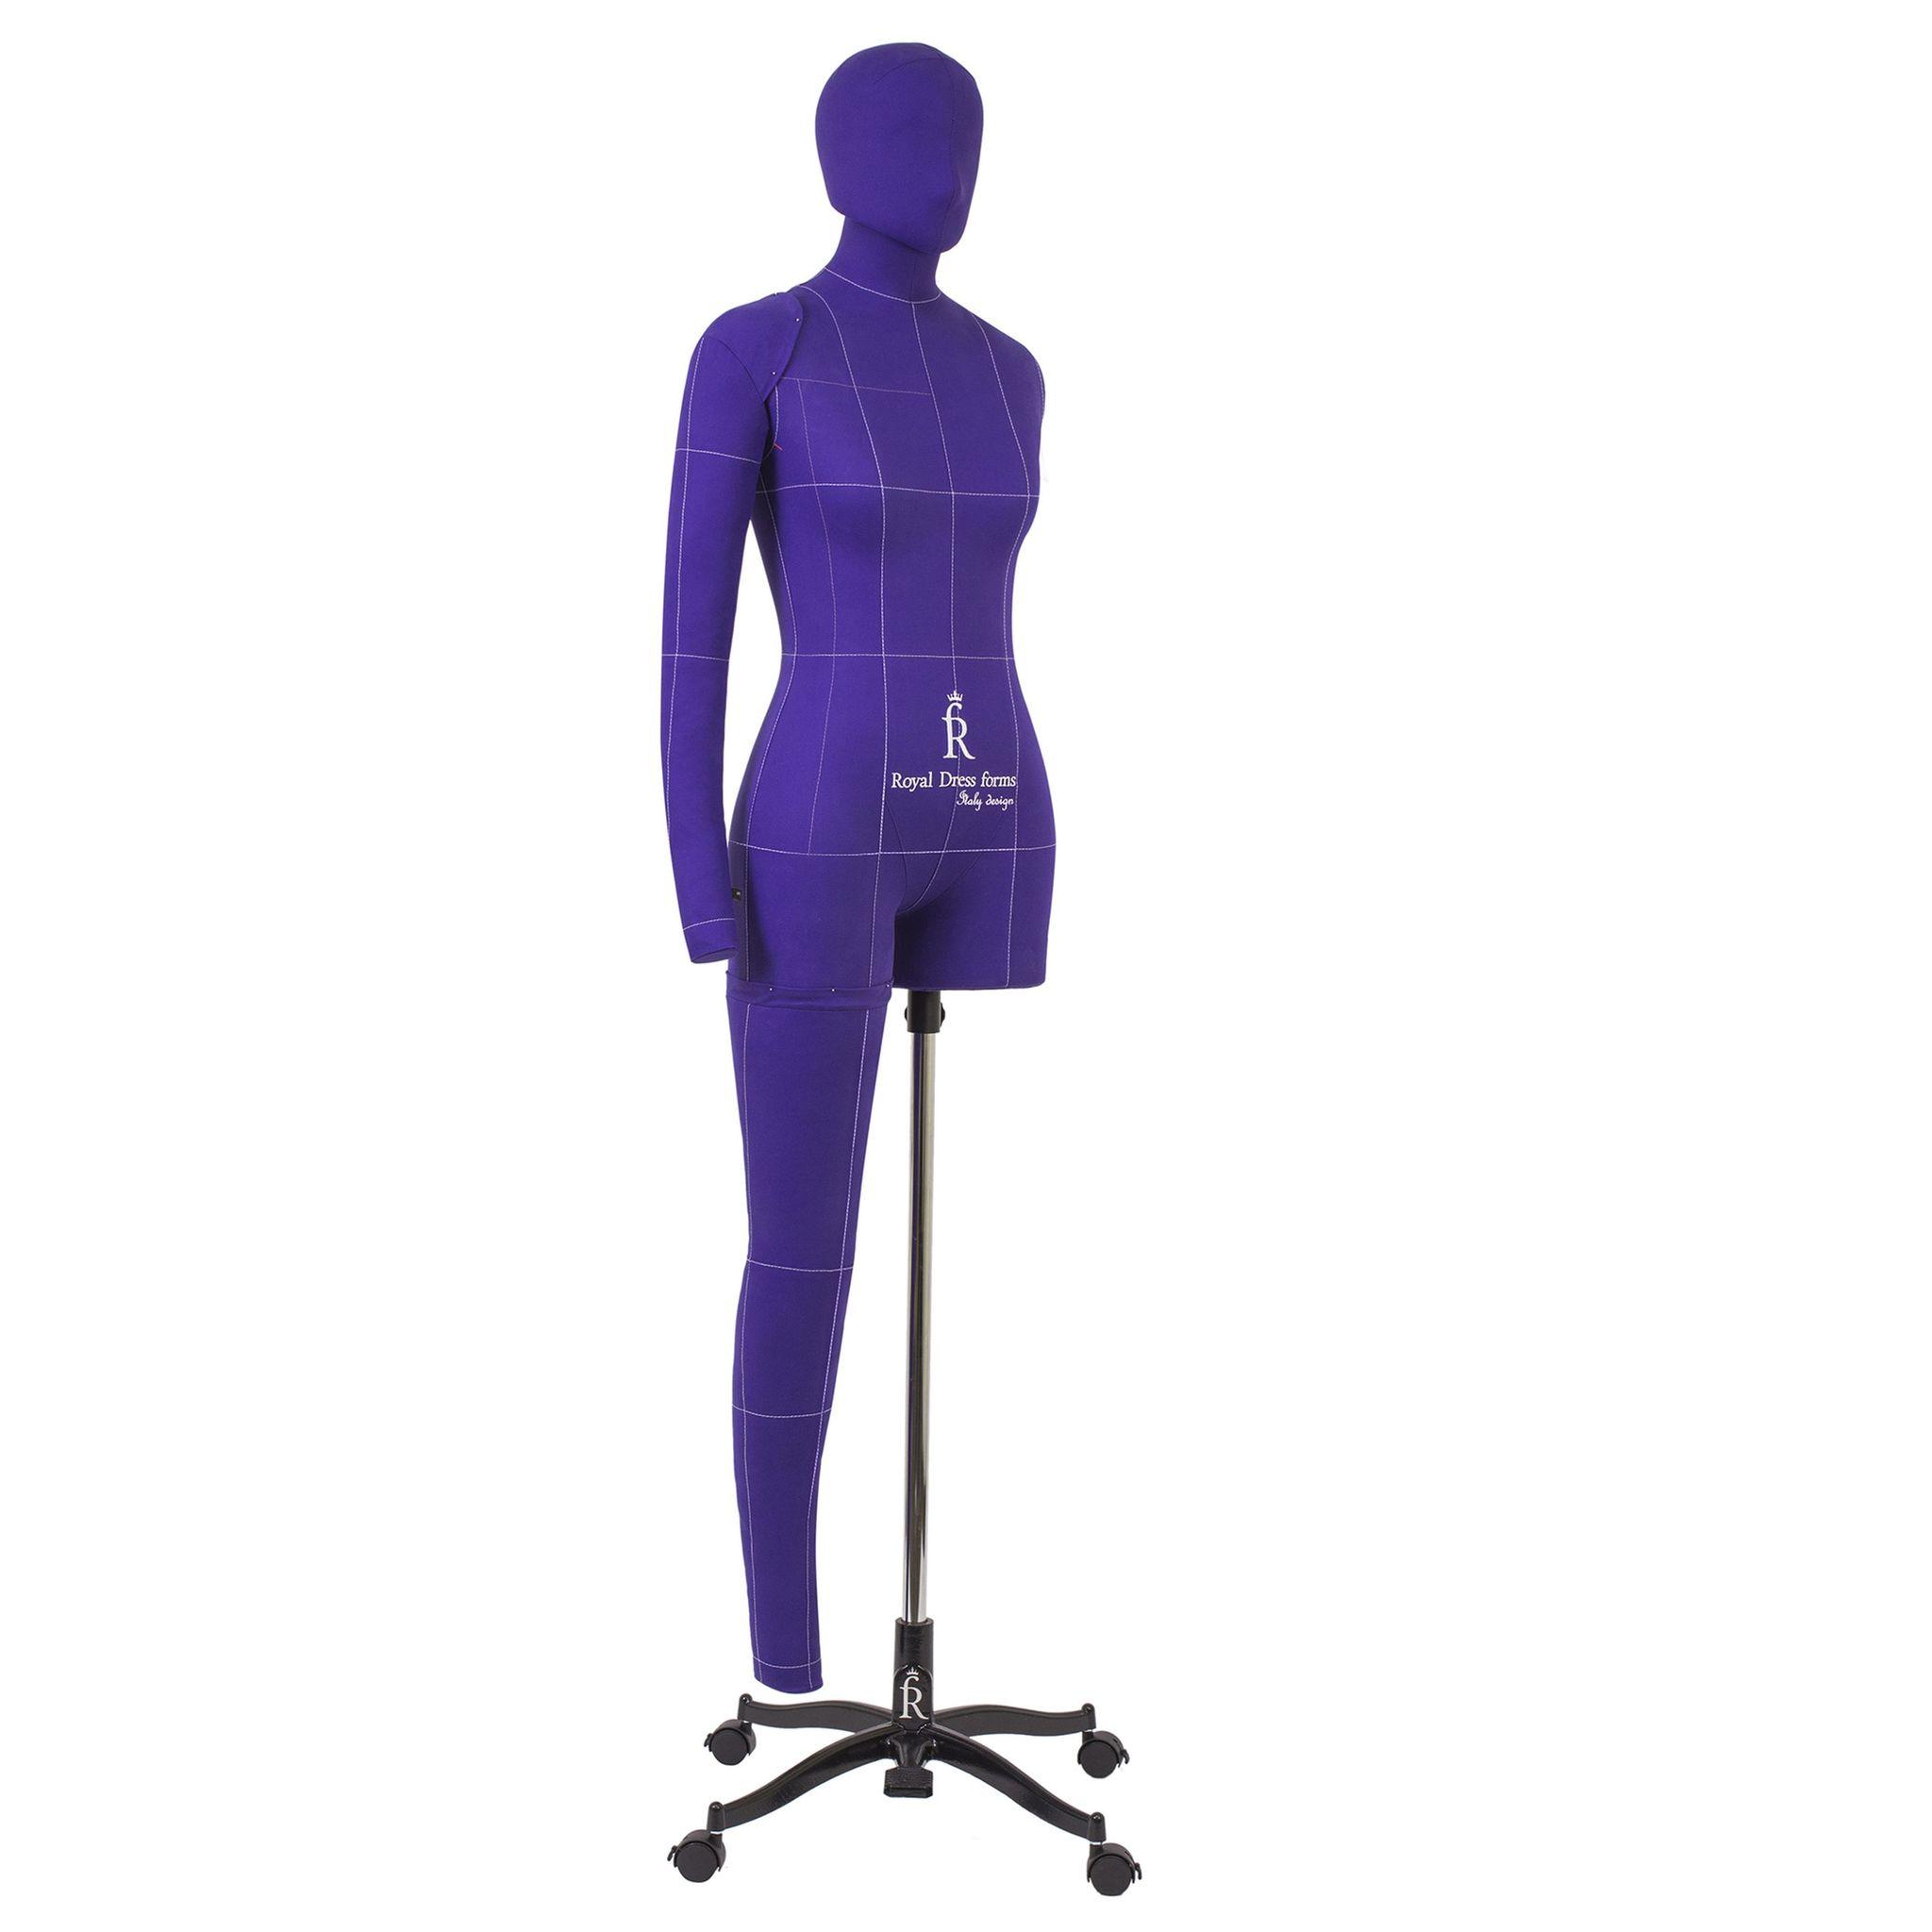 Манекен портновский Моника, комплект Арт, размер 42, ФиолетовыйФото 2